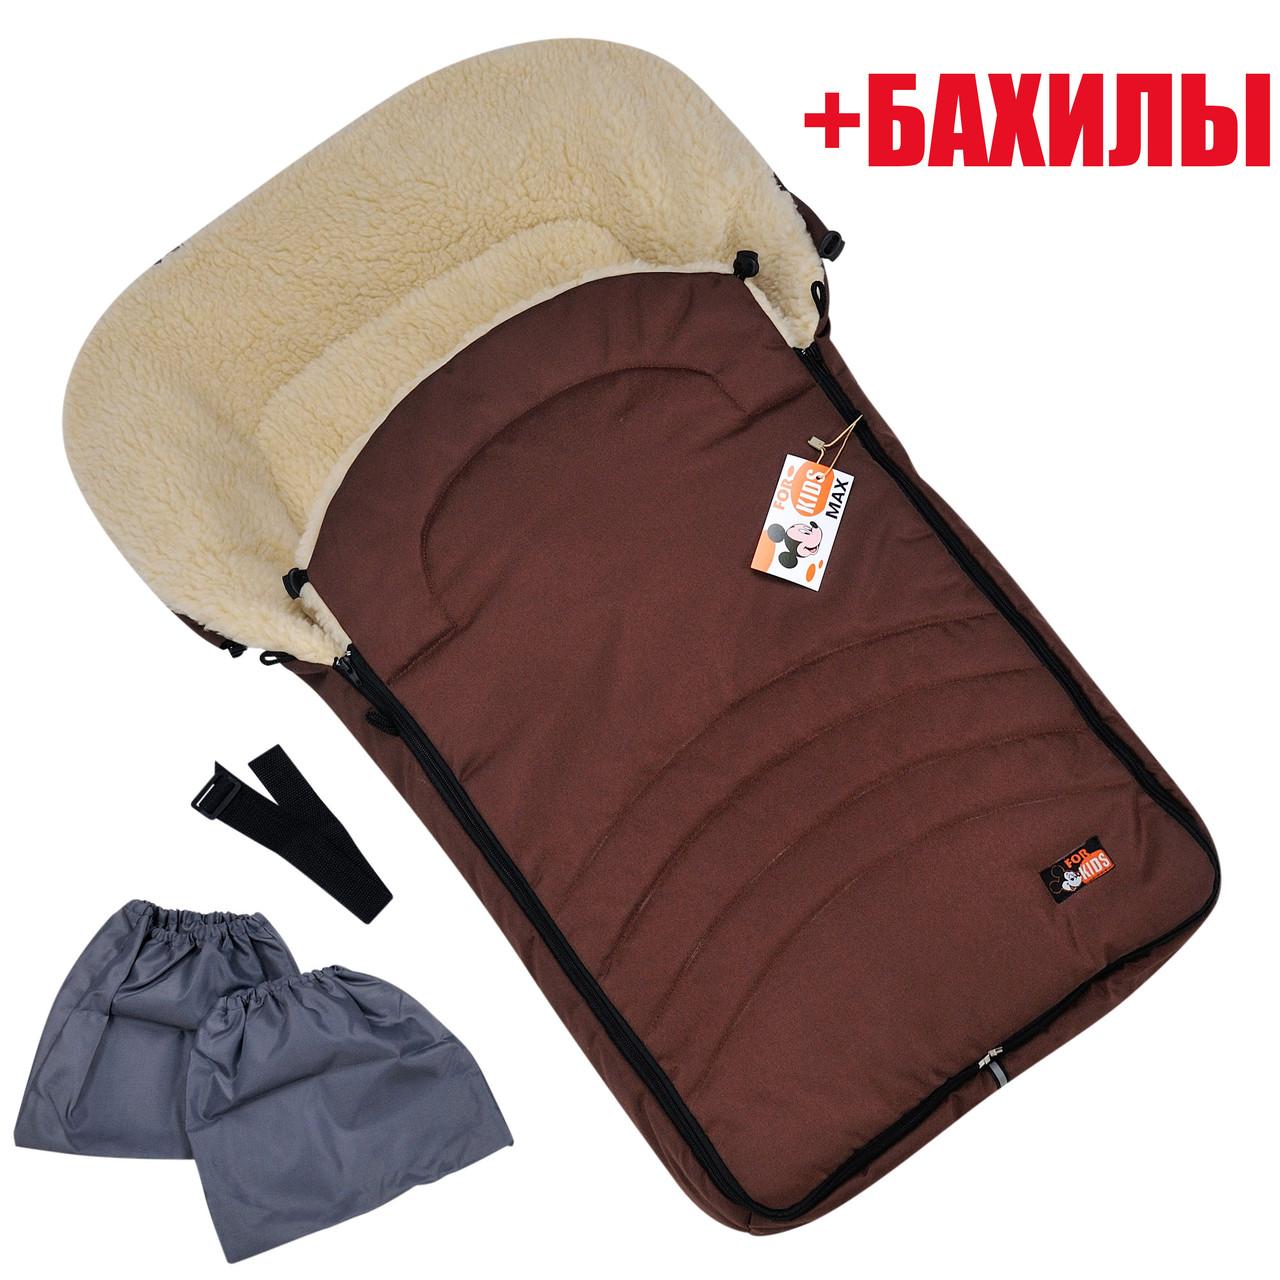 Конверт чехол коричневый на овчине в коляску или на санки 95*45см MAXI For Kids